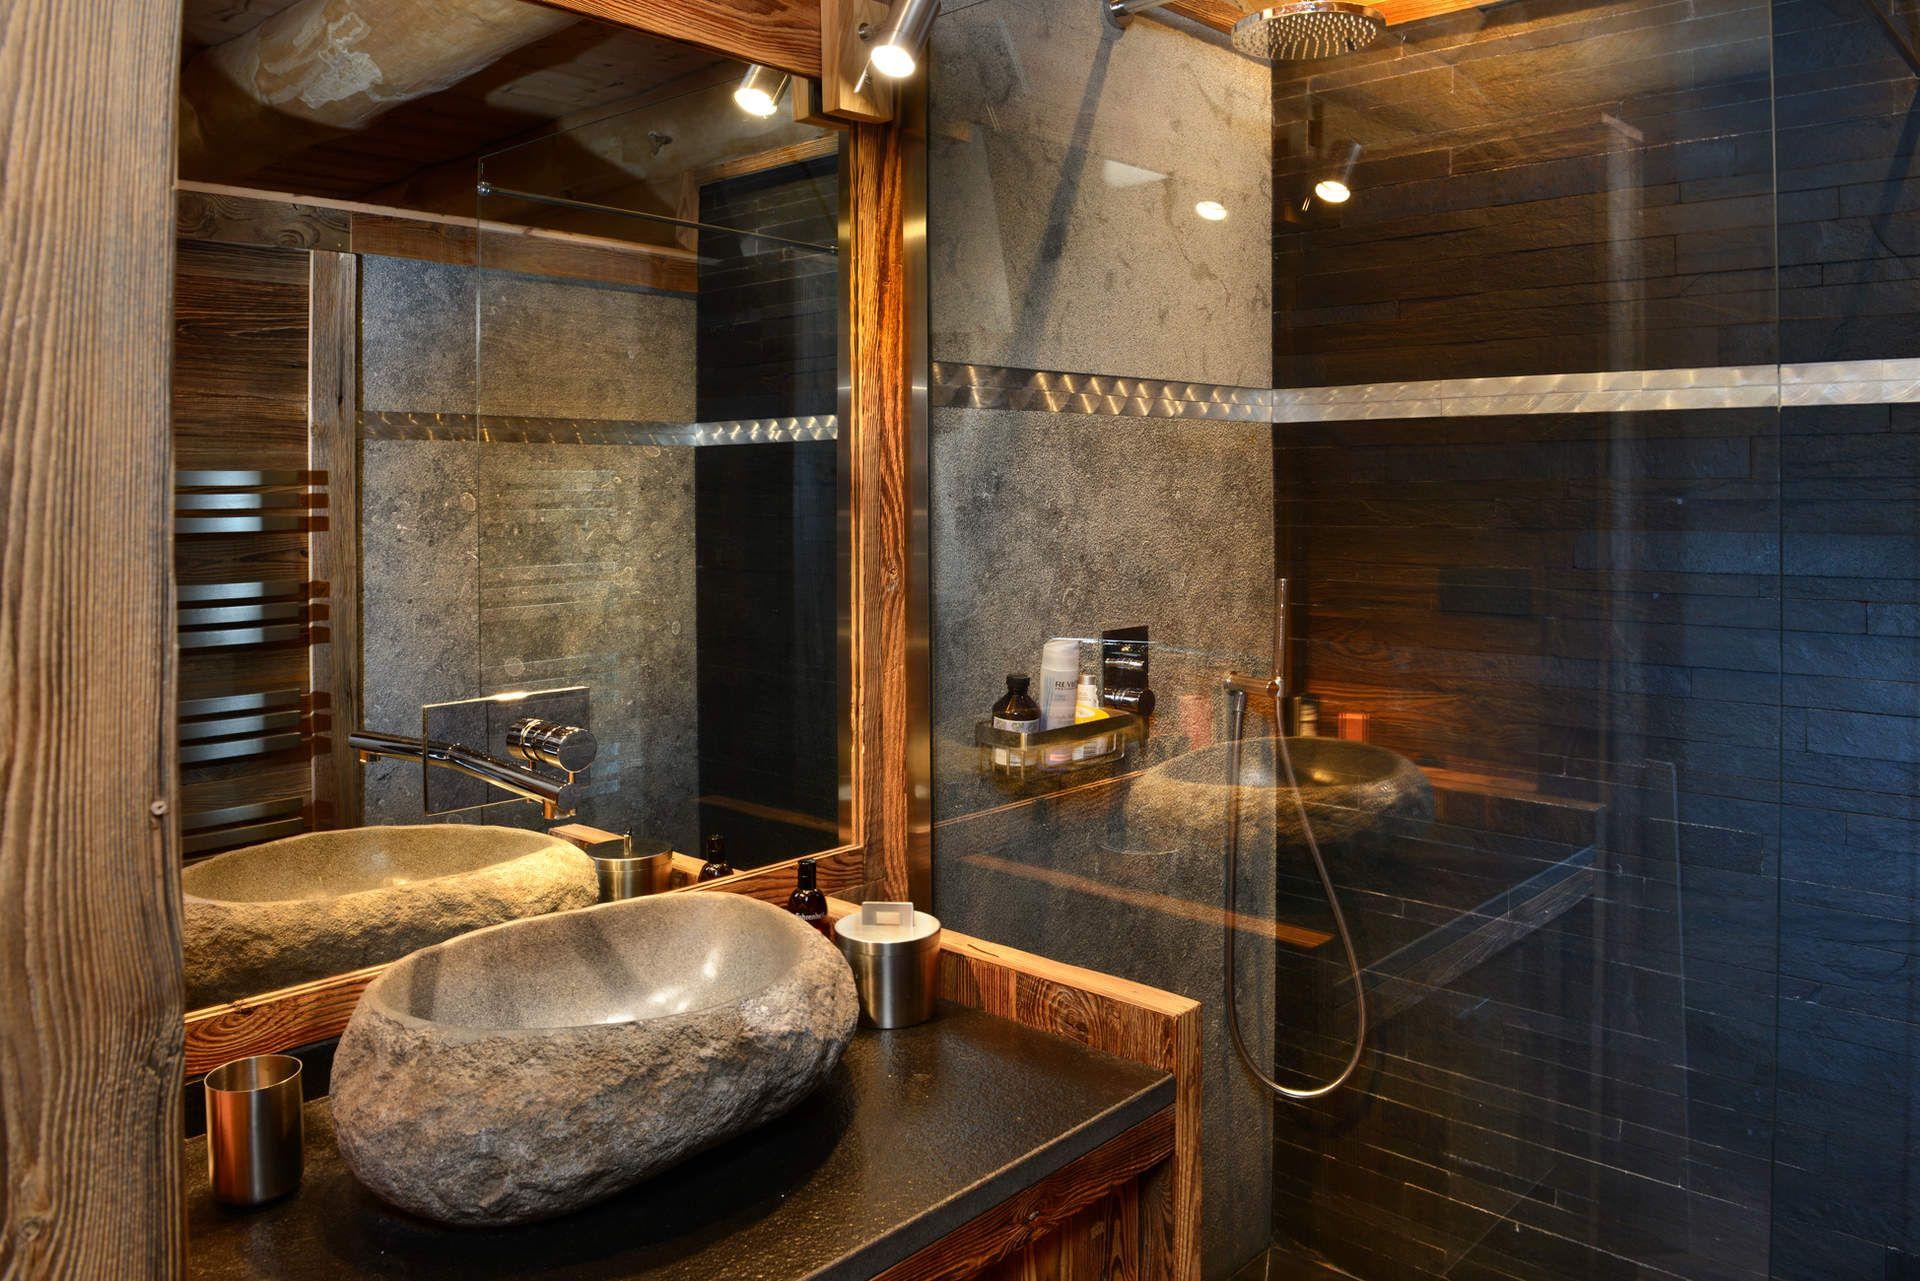 La salle de bain esprit chalet de montagne - masalledebain ...